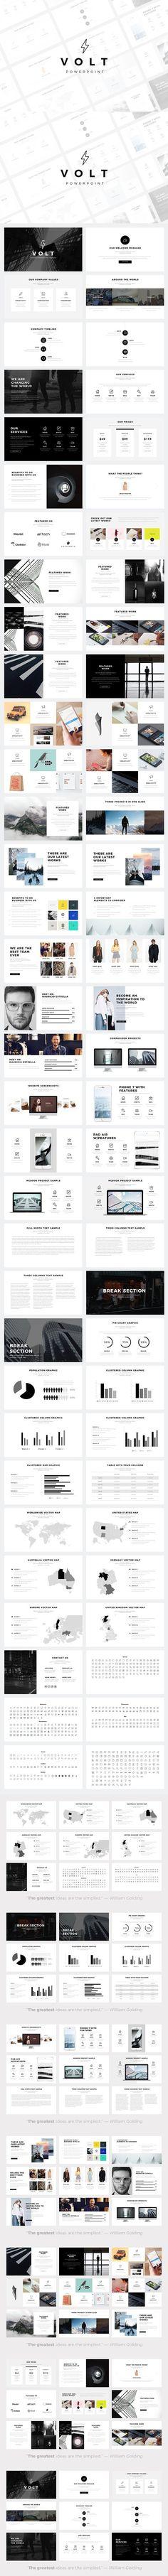 Volt Minimal PowerPoint Template. Graphic Design Infographics. $20.00